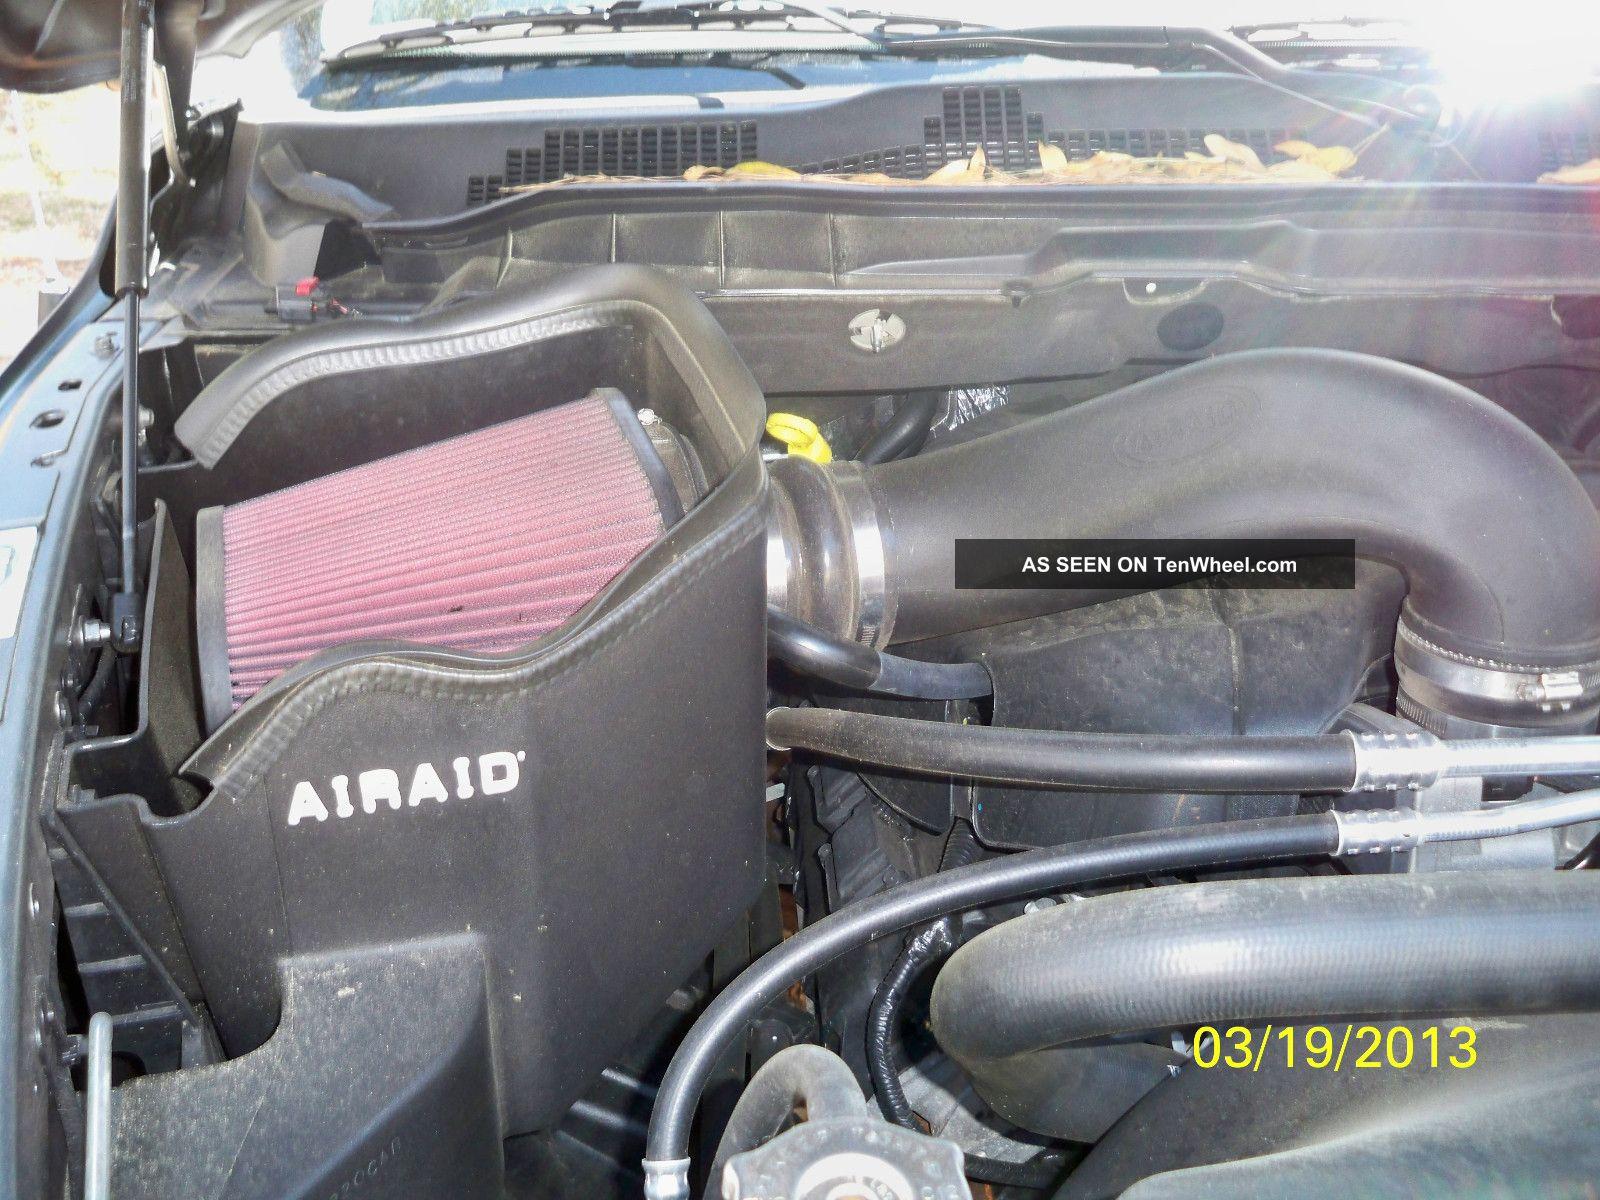 2012 Dodge Ram 1500 Express 4x2 Engine